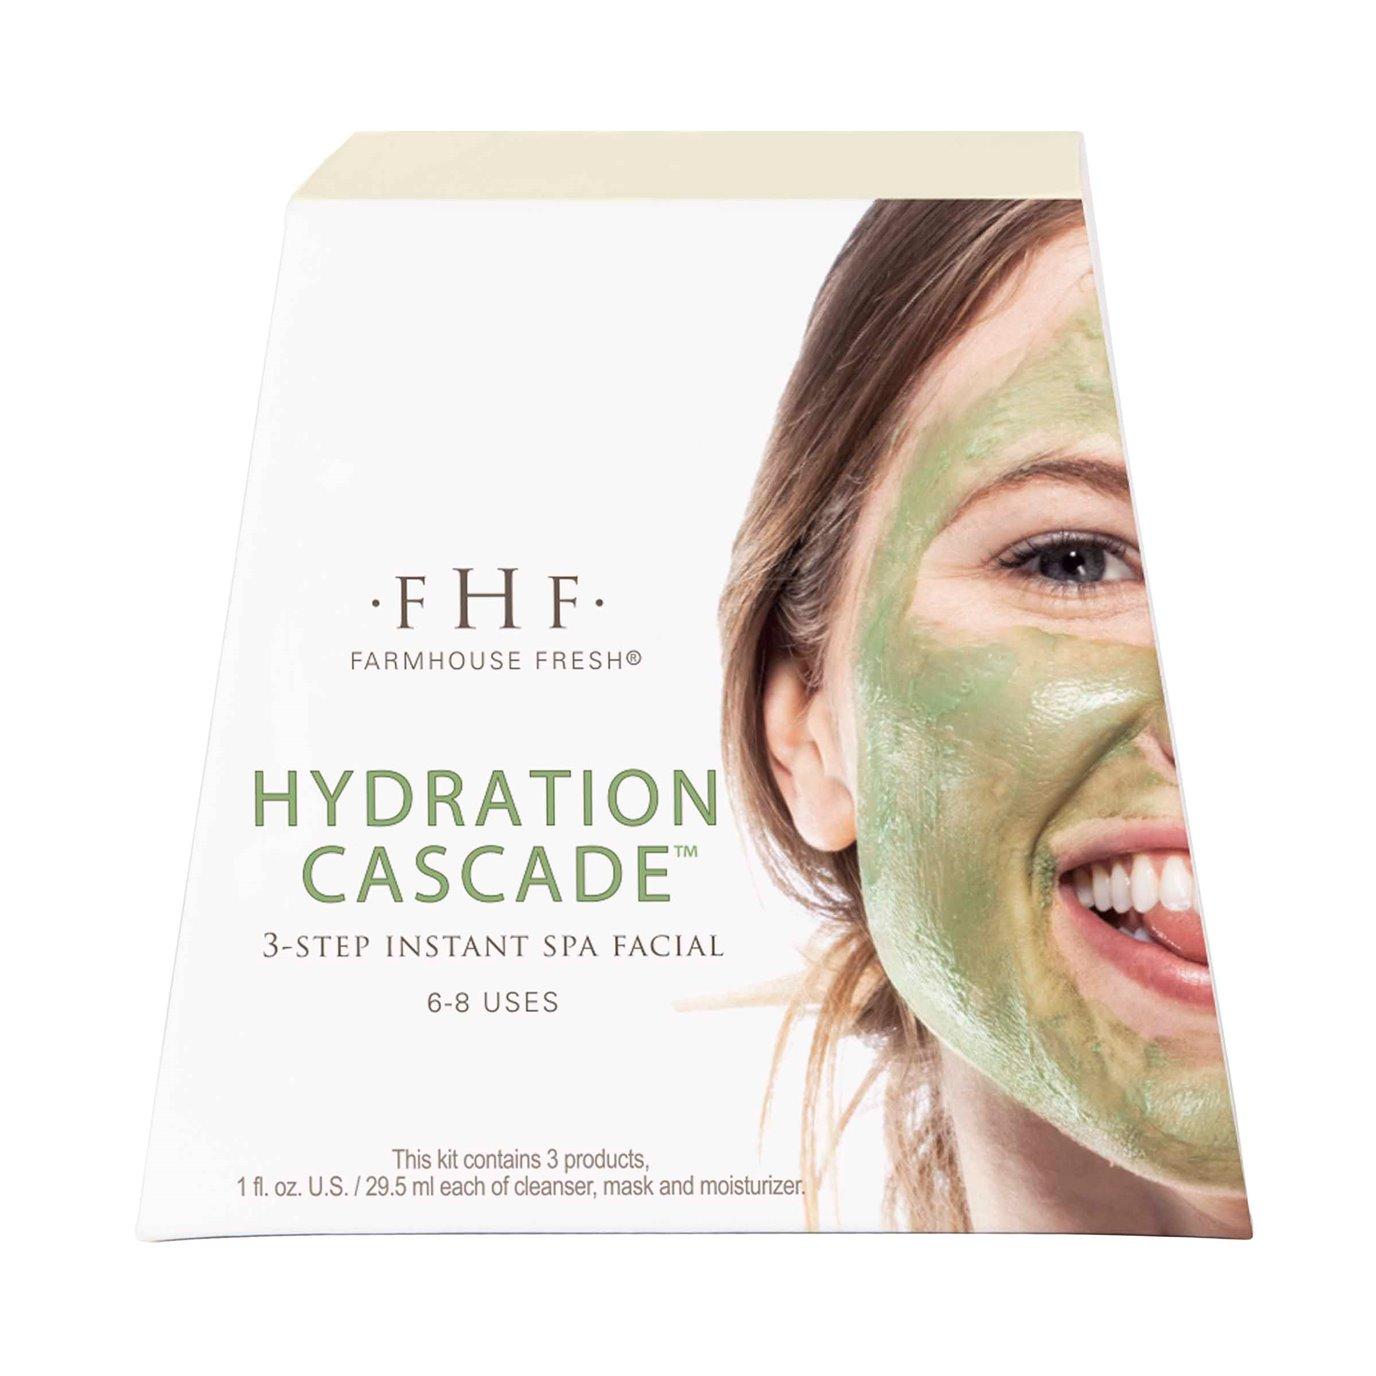 Farmhouse Fresh Hydration Cascade Instant Spa Facial Kit